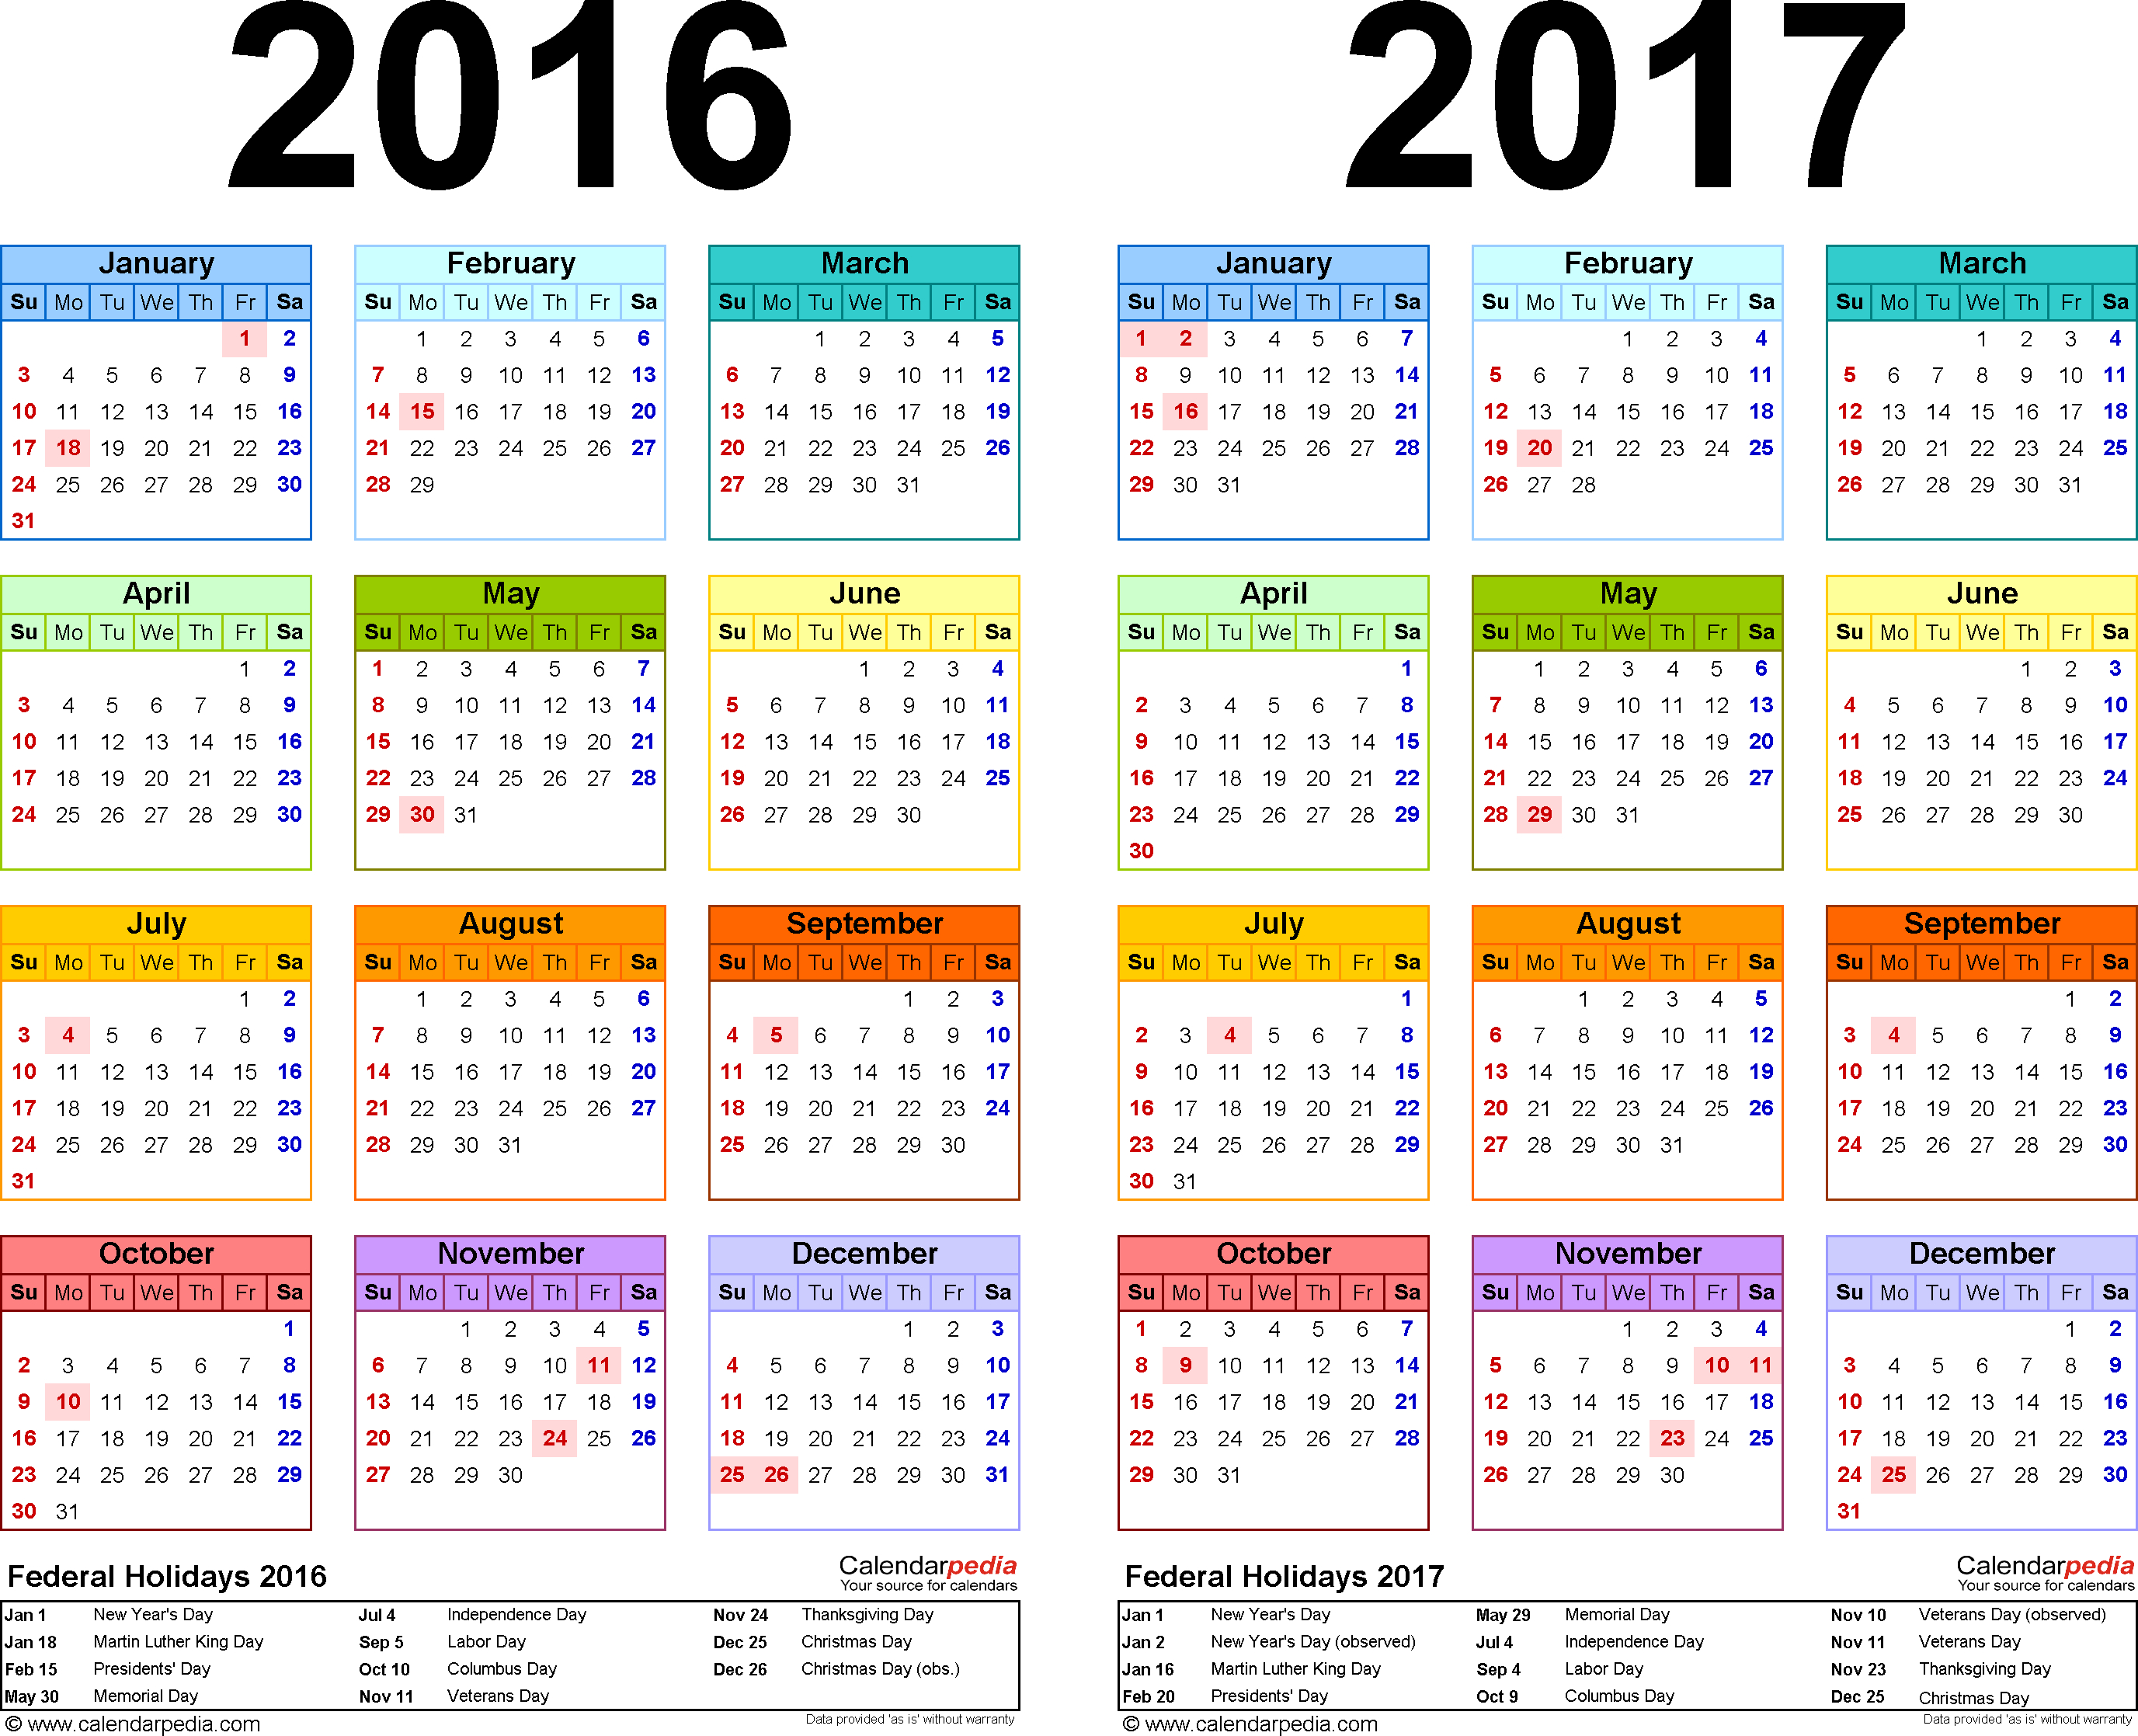 007 Template Ideas Calendar Awful Weekly 2016 Free Printable with regard to Printable 2020 Wallet Calendar